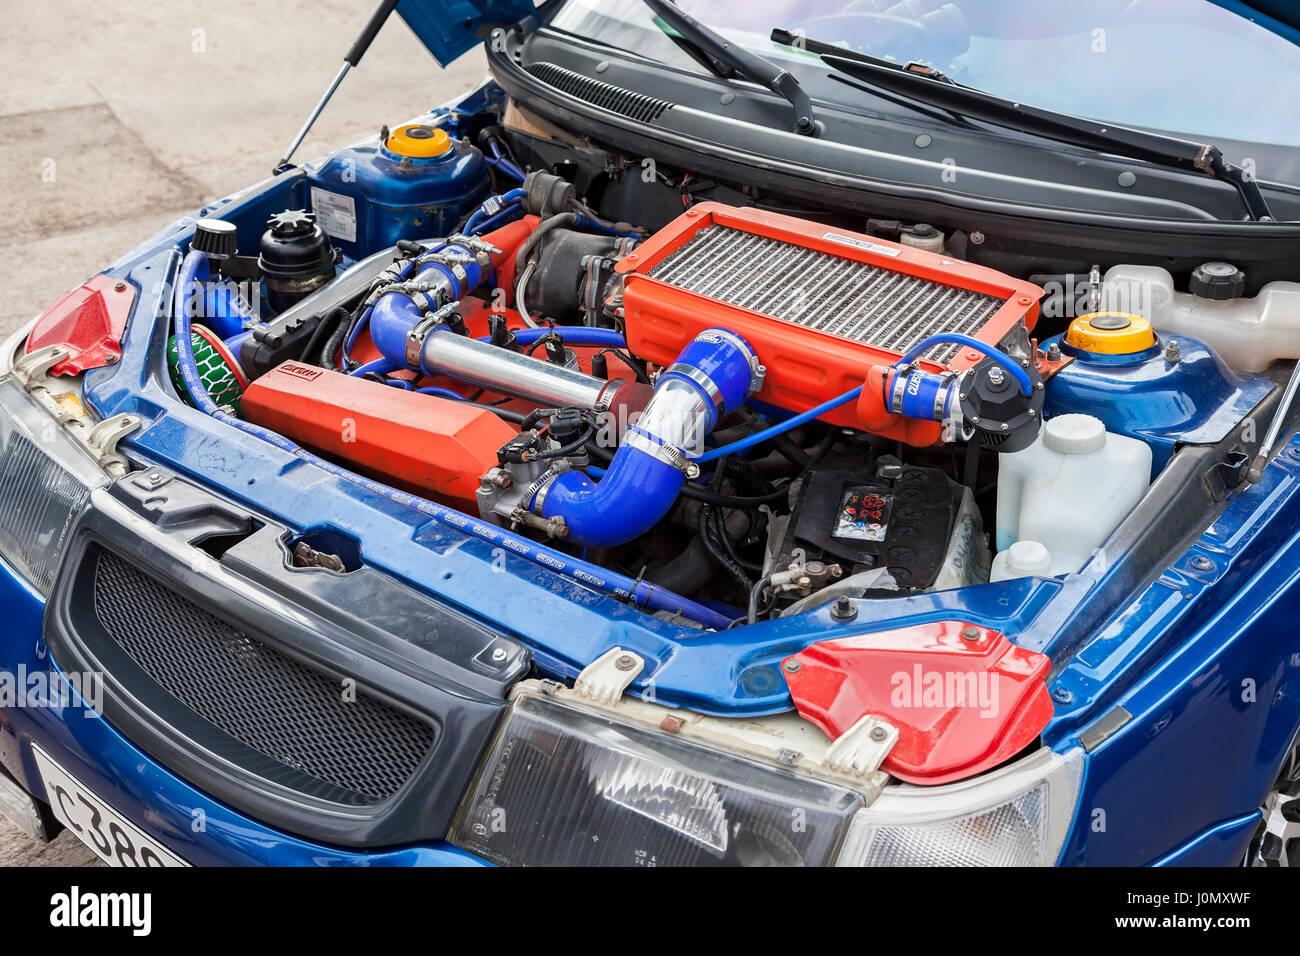 Samara, Russland - 5. September 2015: Tuned Turbomotor Auto Lada Closeup Stockbild